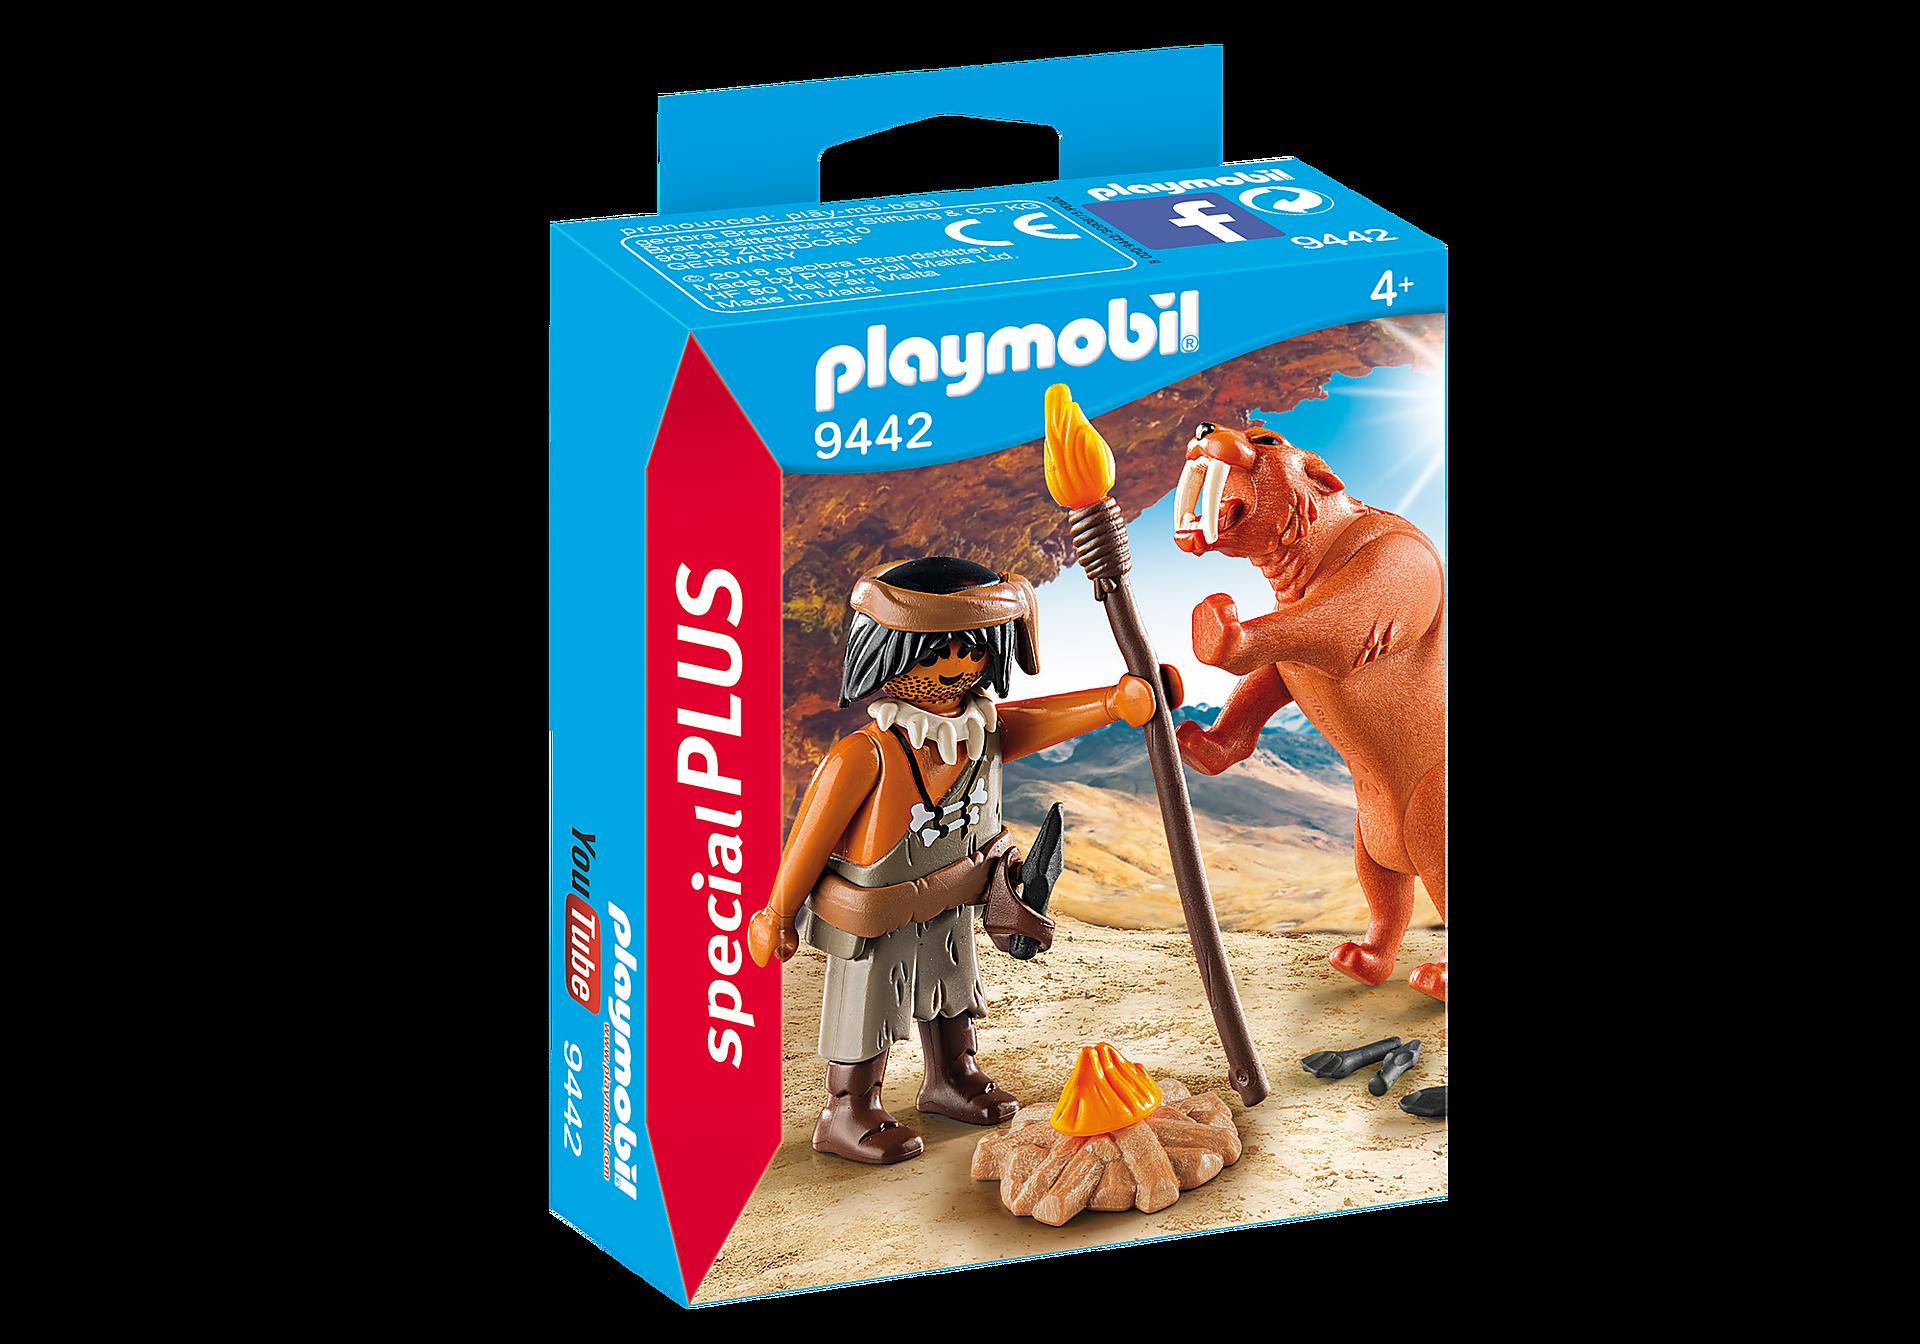 http://media.playmobil.com/i/playmobil/9442_product_box_front/Άνθρωπος των σπηλαίων με τίγρη